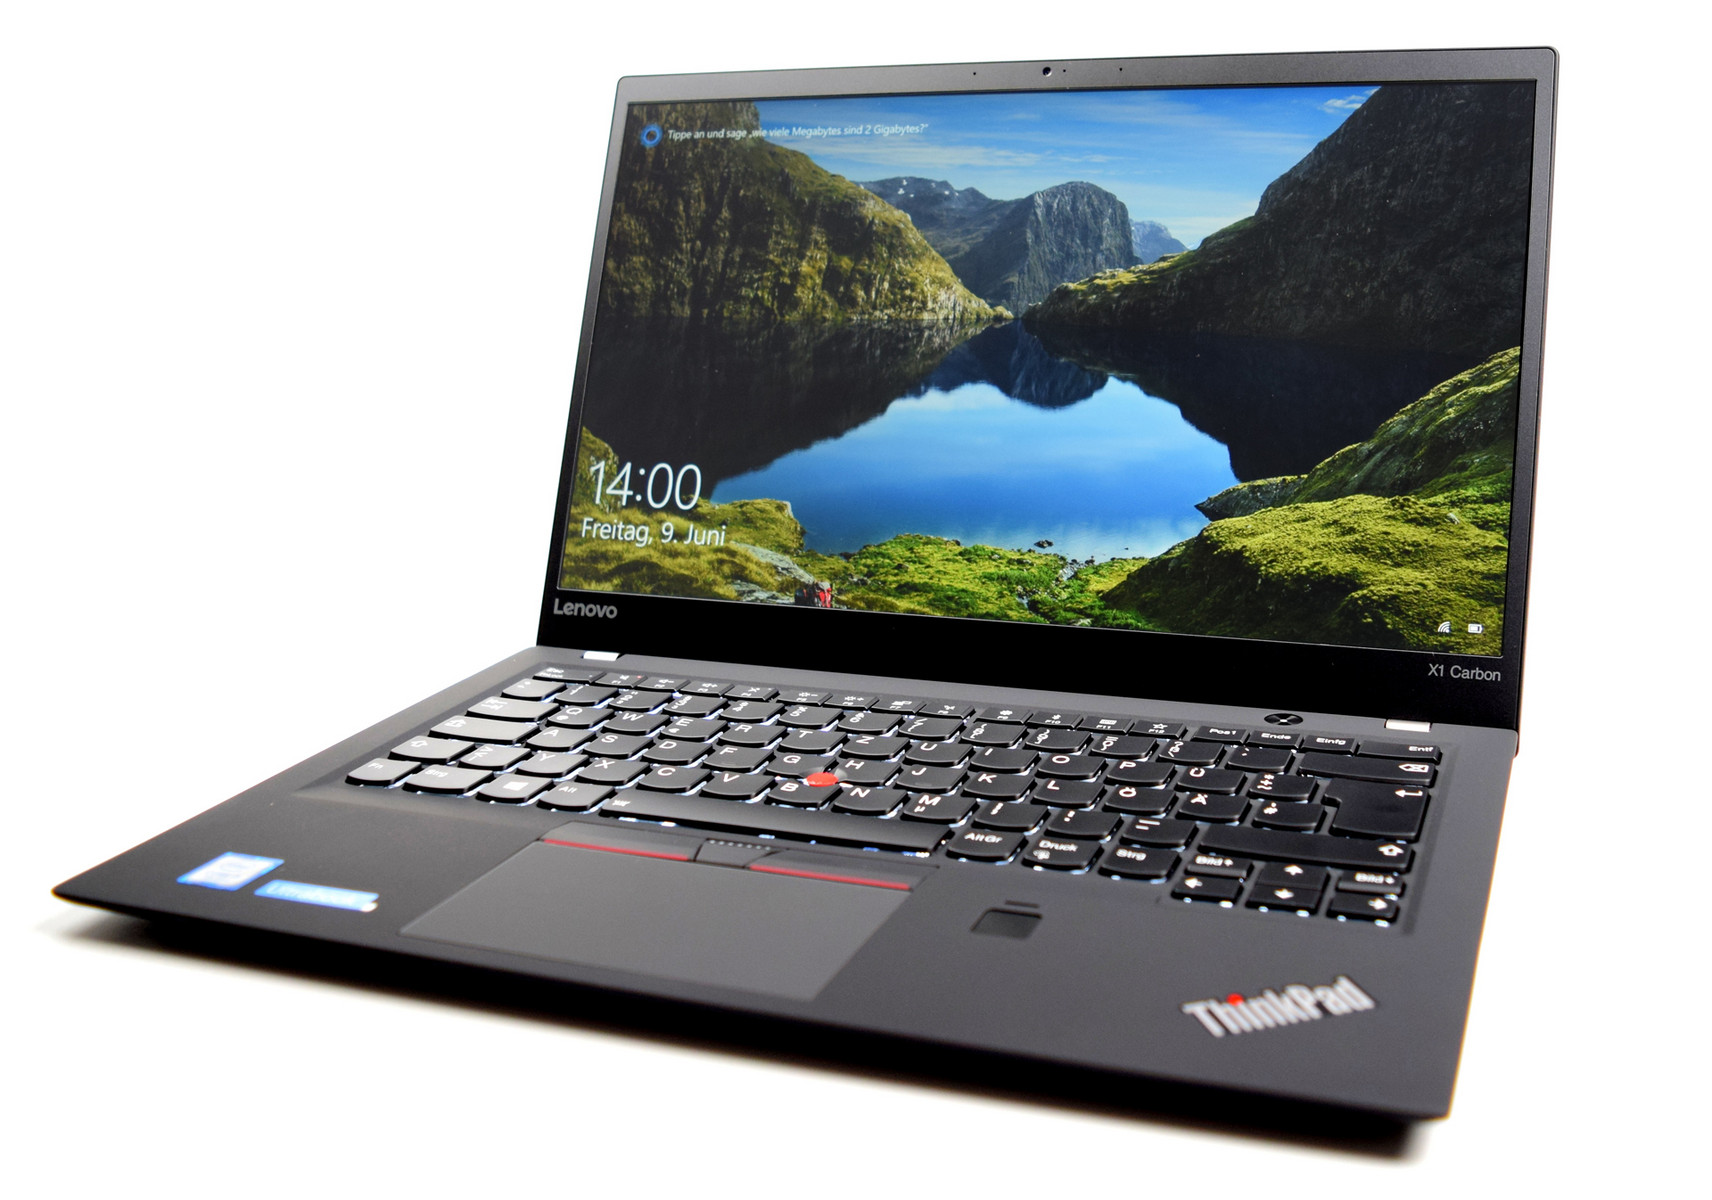 Lenovo Thinkpad X1 Carbon 2017 20hr0021ge Notebookchecknet